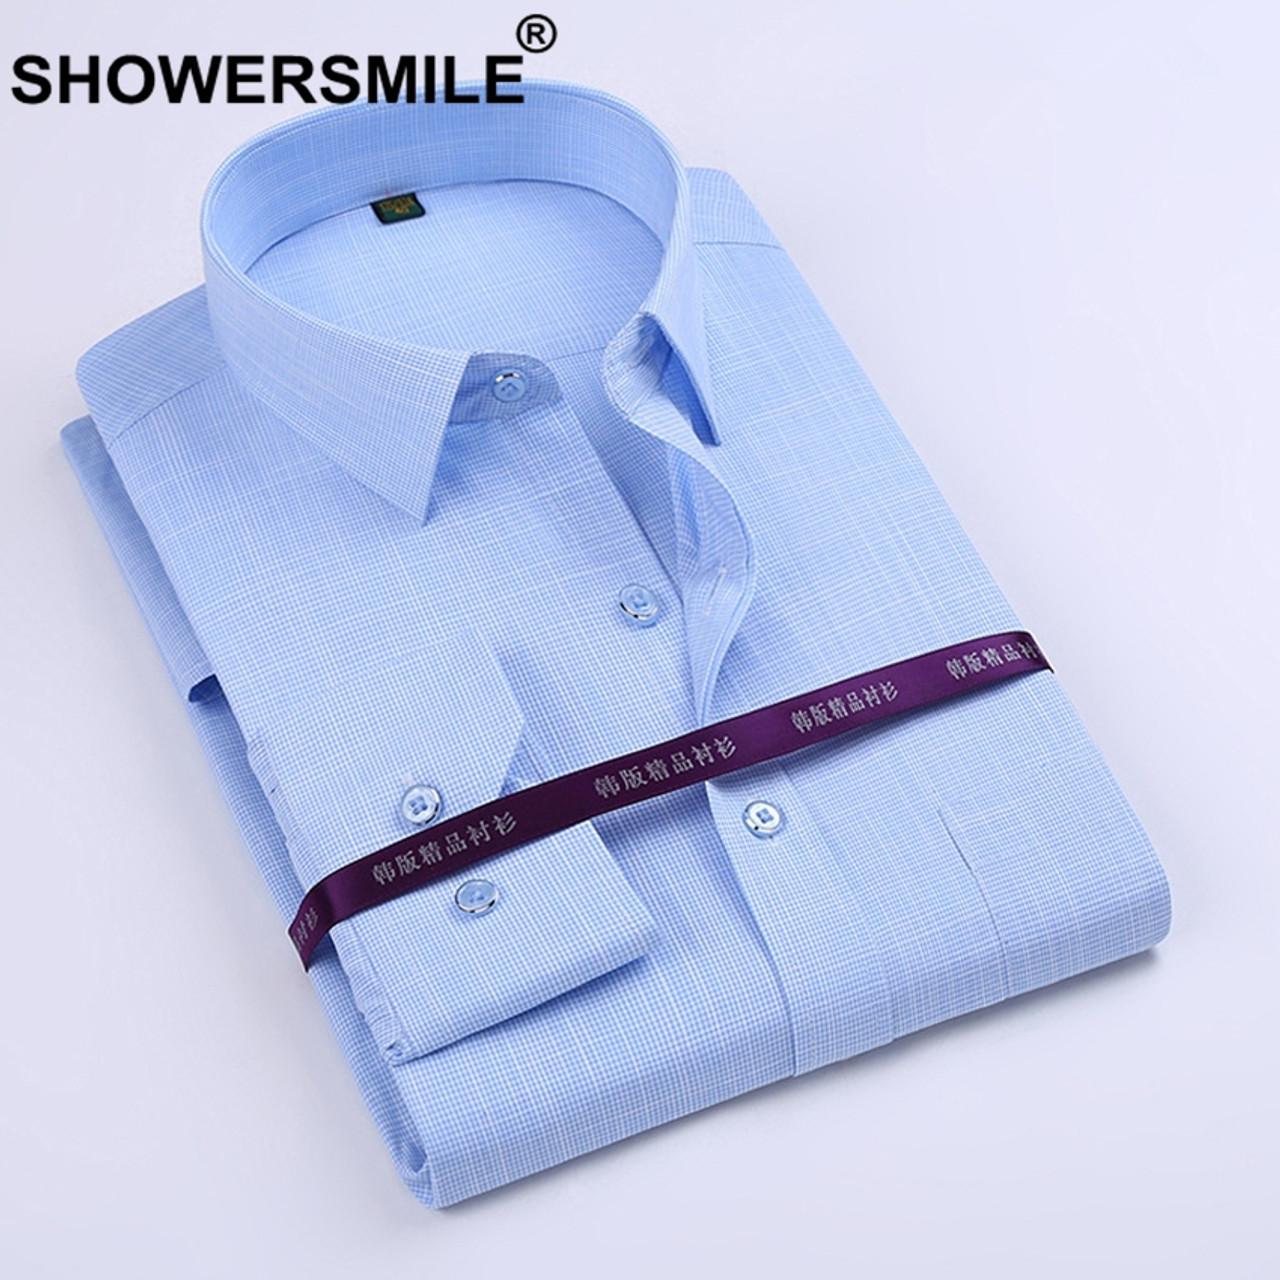 487473243e6f SHOWERSMILE Brand Bamboo Fiber Shirt Mens Long Sleeve Dress Shirts Slim Fit  Party Business Social Cotton ...